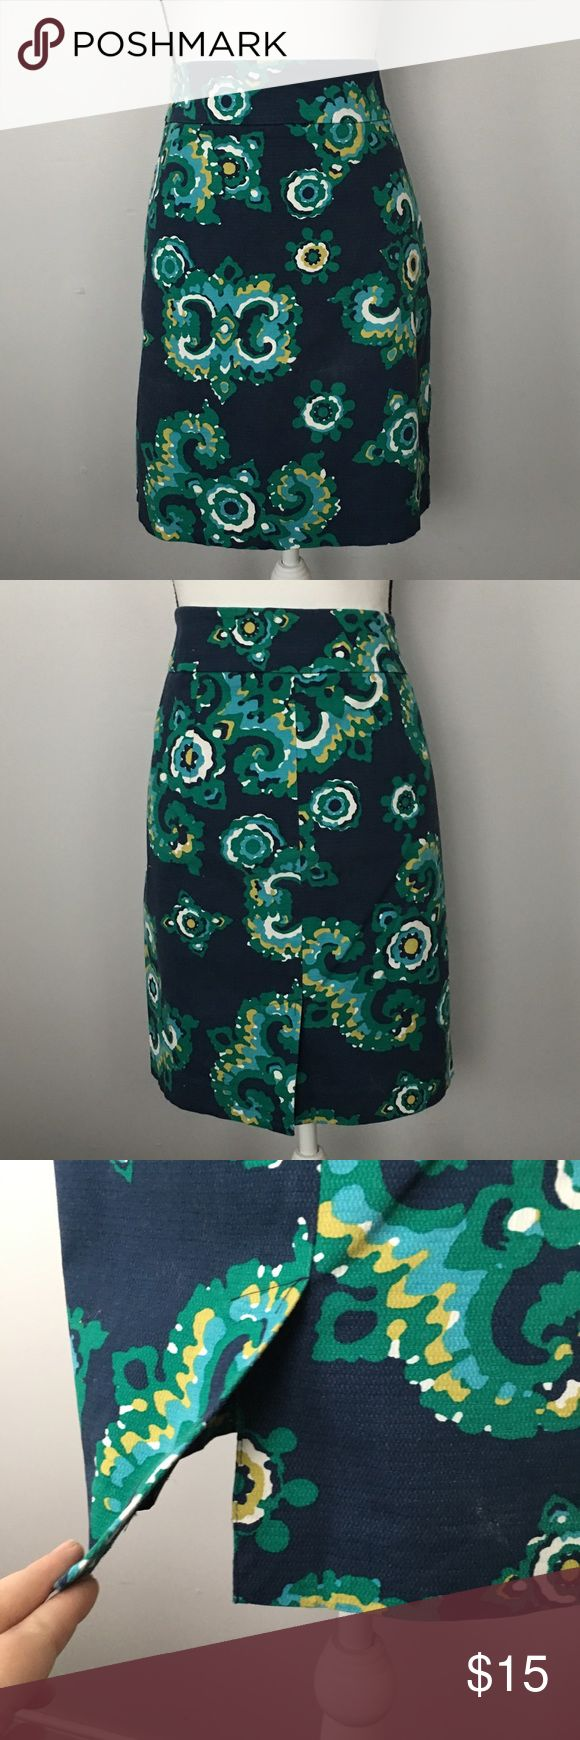 "EUC Merona Navy Blue Floral Pencil Skirt Navy Blue Floral Pencil Skirt Merona Target Size 10 16.25"" Waist (Measured Flat) 20.5"" Long Merona Skirts Pencil"